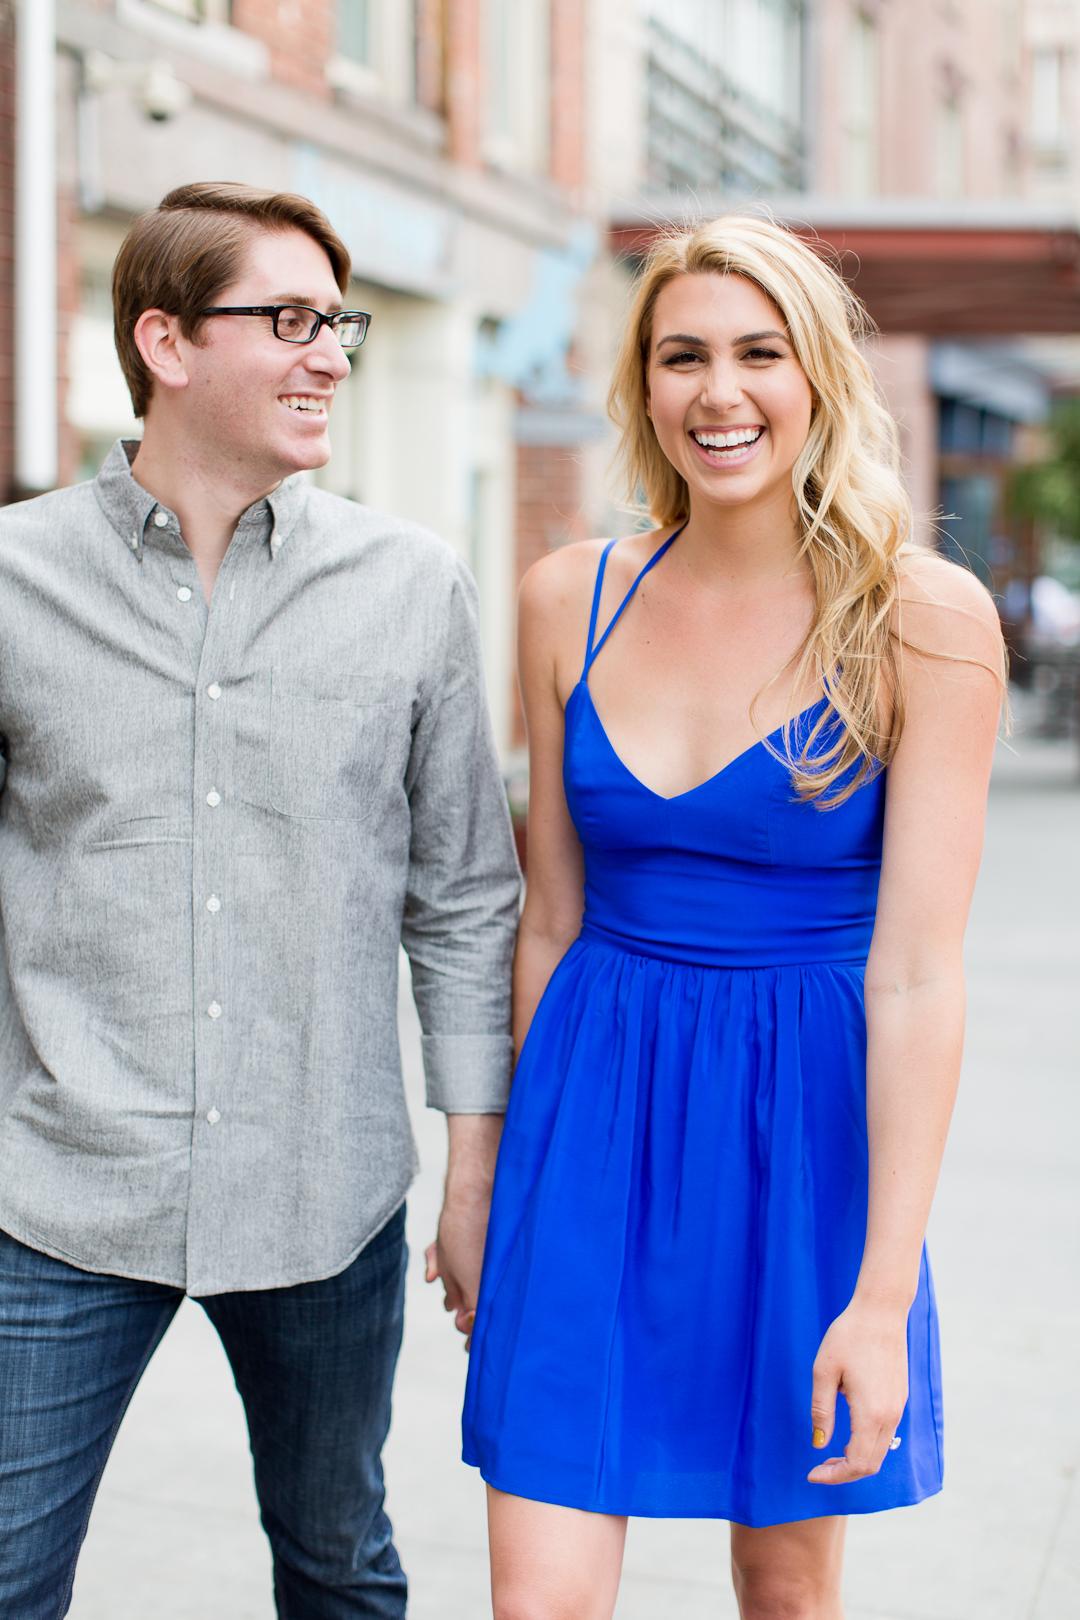 Melissa Kruse Photography - Kelley & Billy Engagement Photos-31.jpg